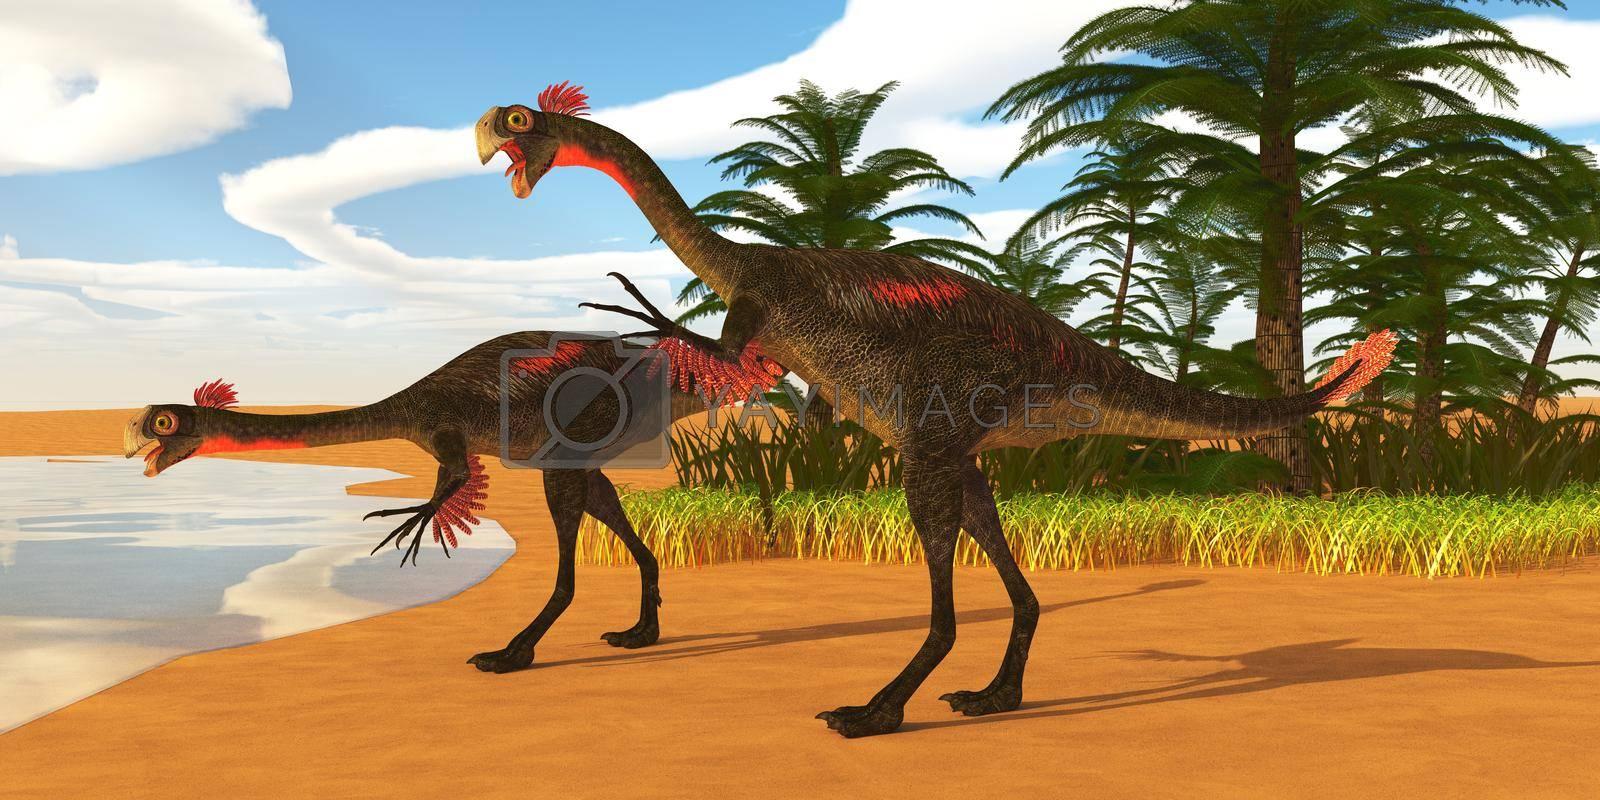 Royalty free image of Gigantoraptor Dinosaur Lakeshore by Catmando